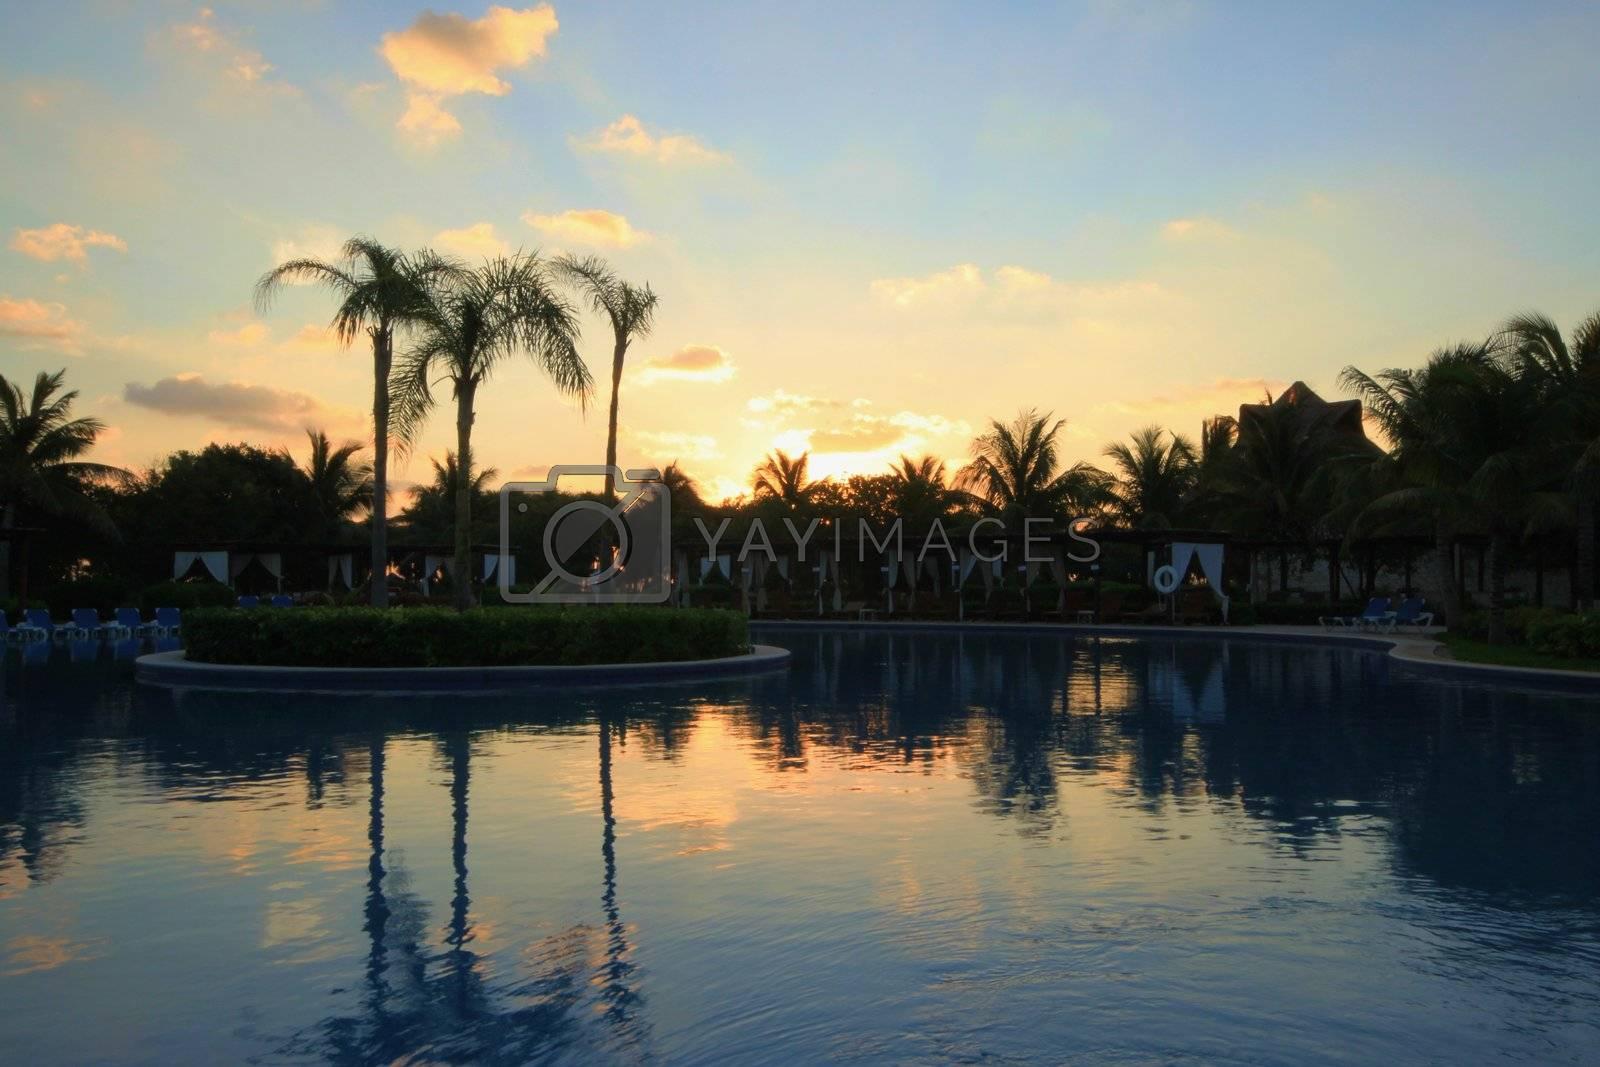 Resort pool taken at sunrise before crowd shows up